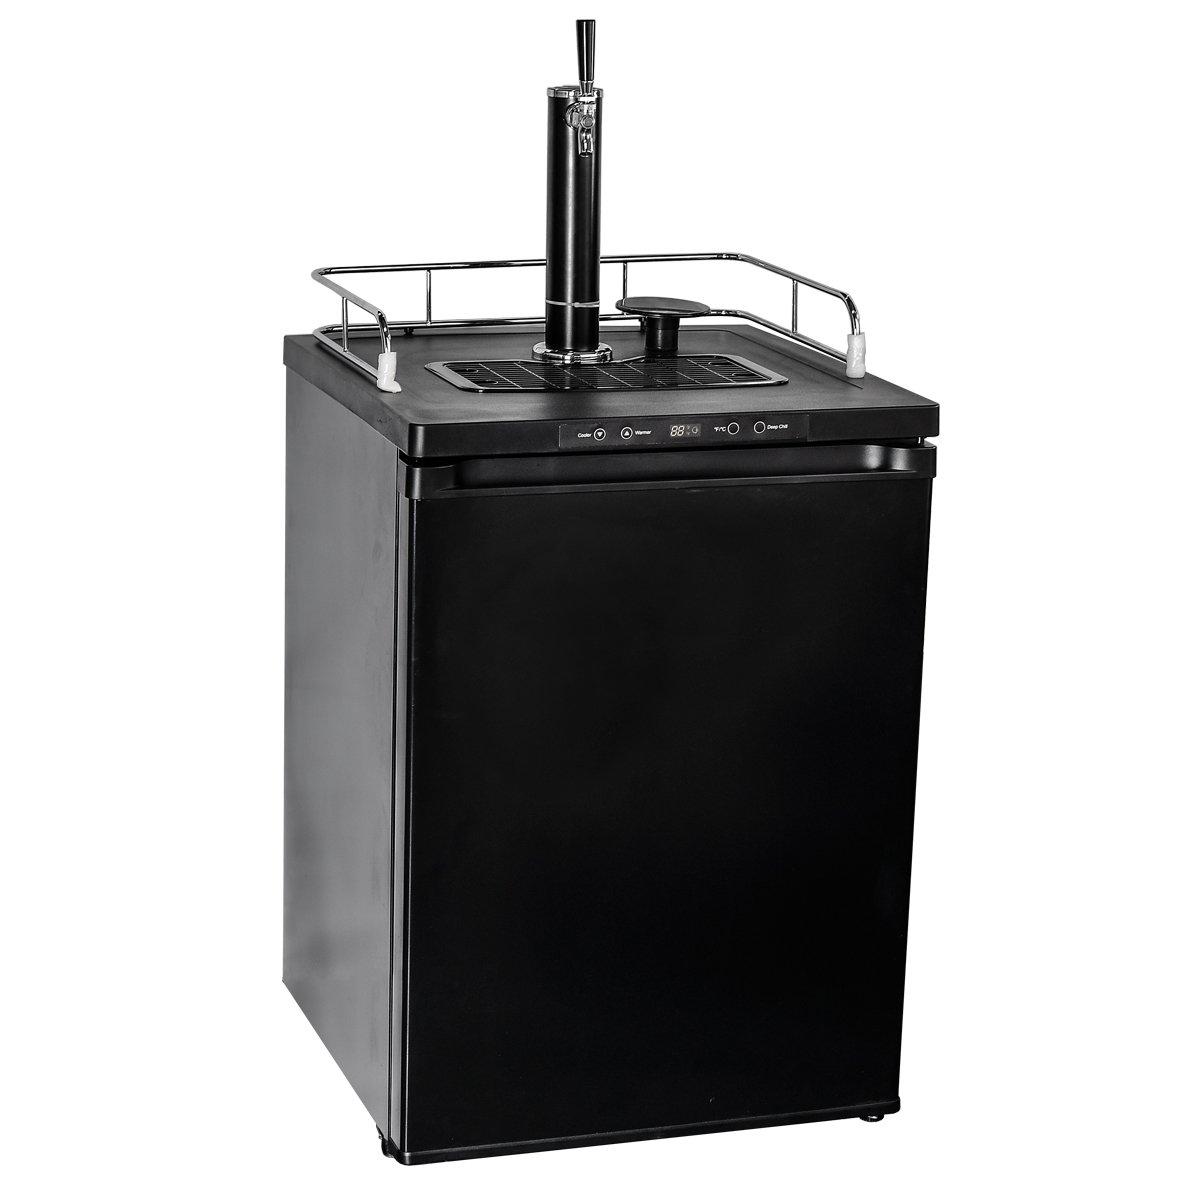 Smad Free Standing Beer Dispenser Electronic refrigerator, 5.6 cu ft,Black